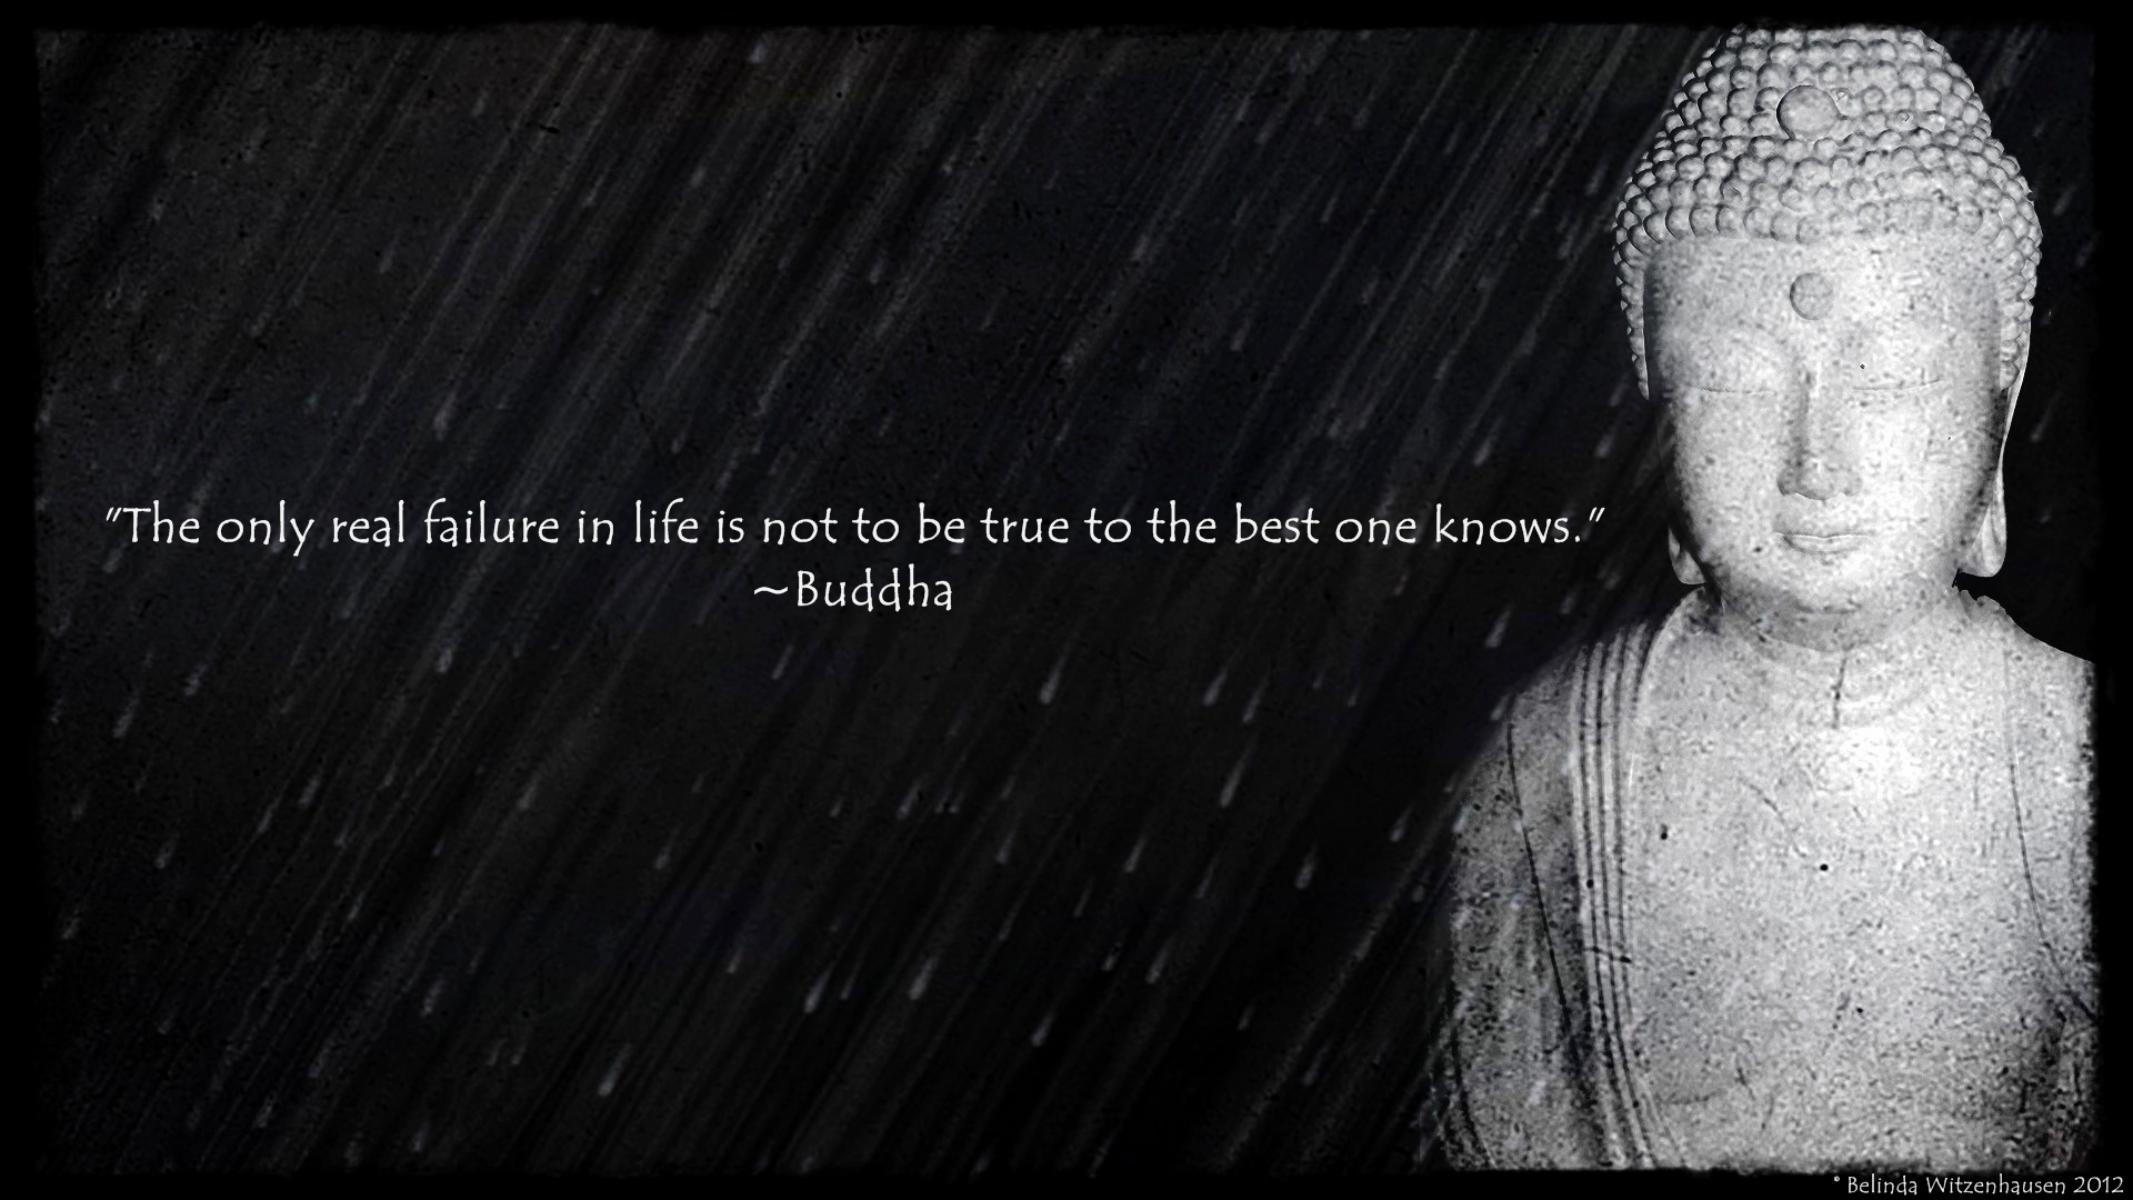 Wallpaper Buddha Quotes: Sfondi Desktop Buddha